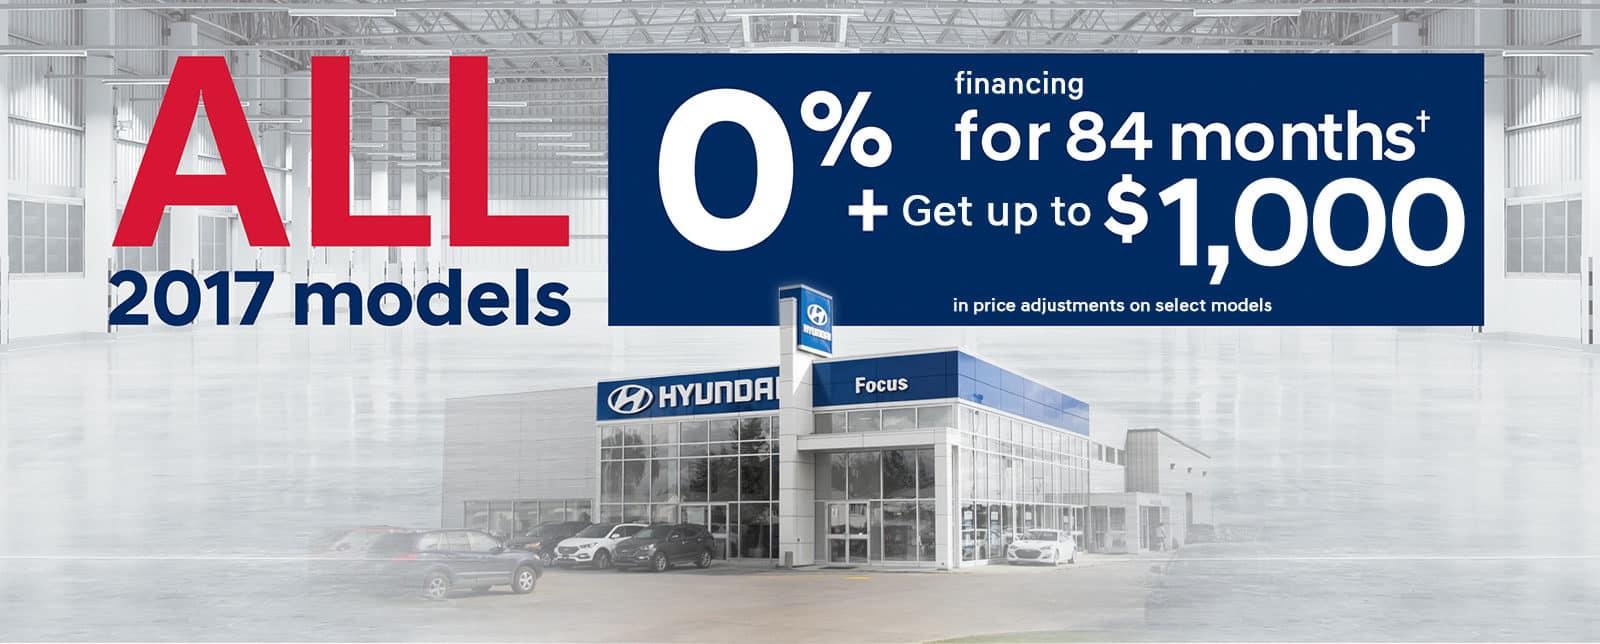 focus hyundai in winnipeg mb new and used cars